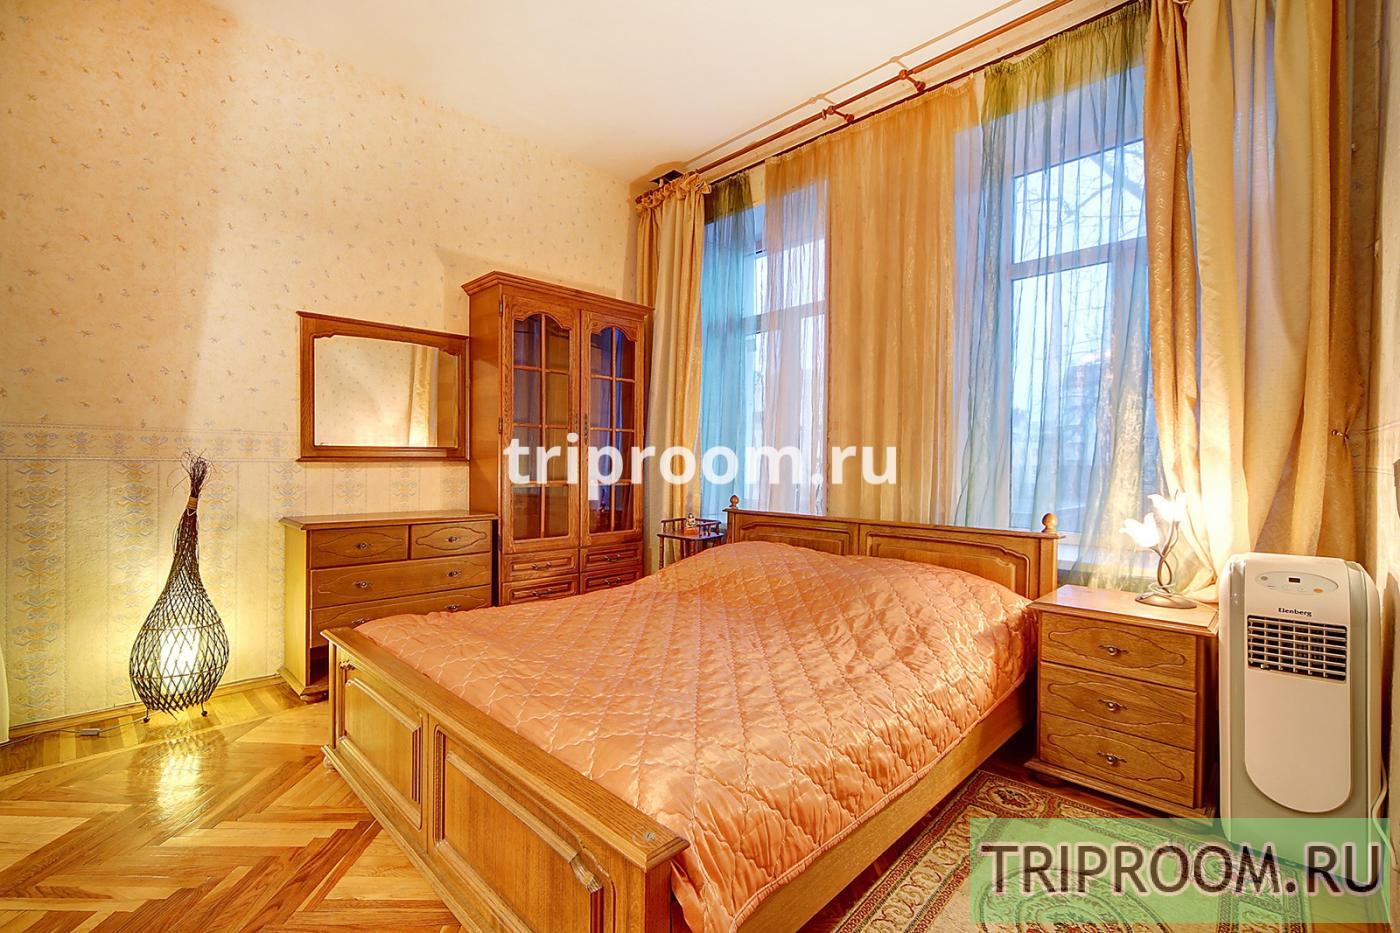 1-комнатная квартира посуточно (вариант № 15445), ул. Лиговский проспект, фото № 3